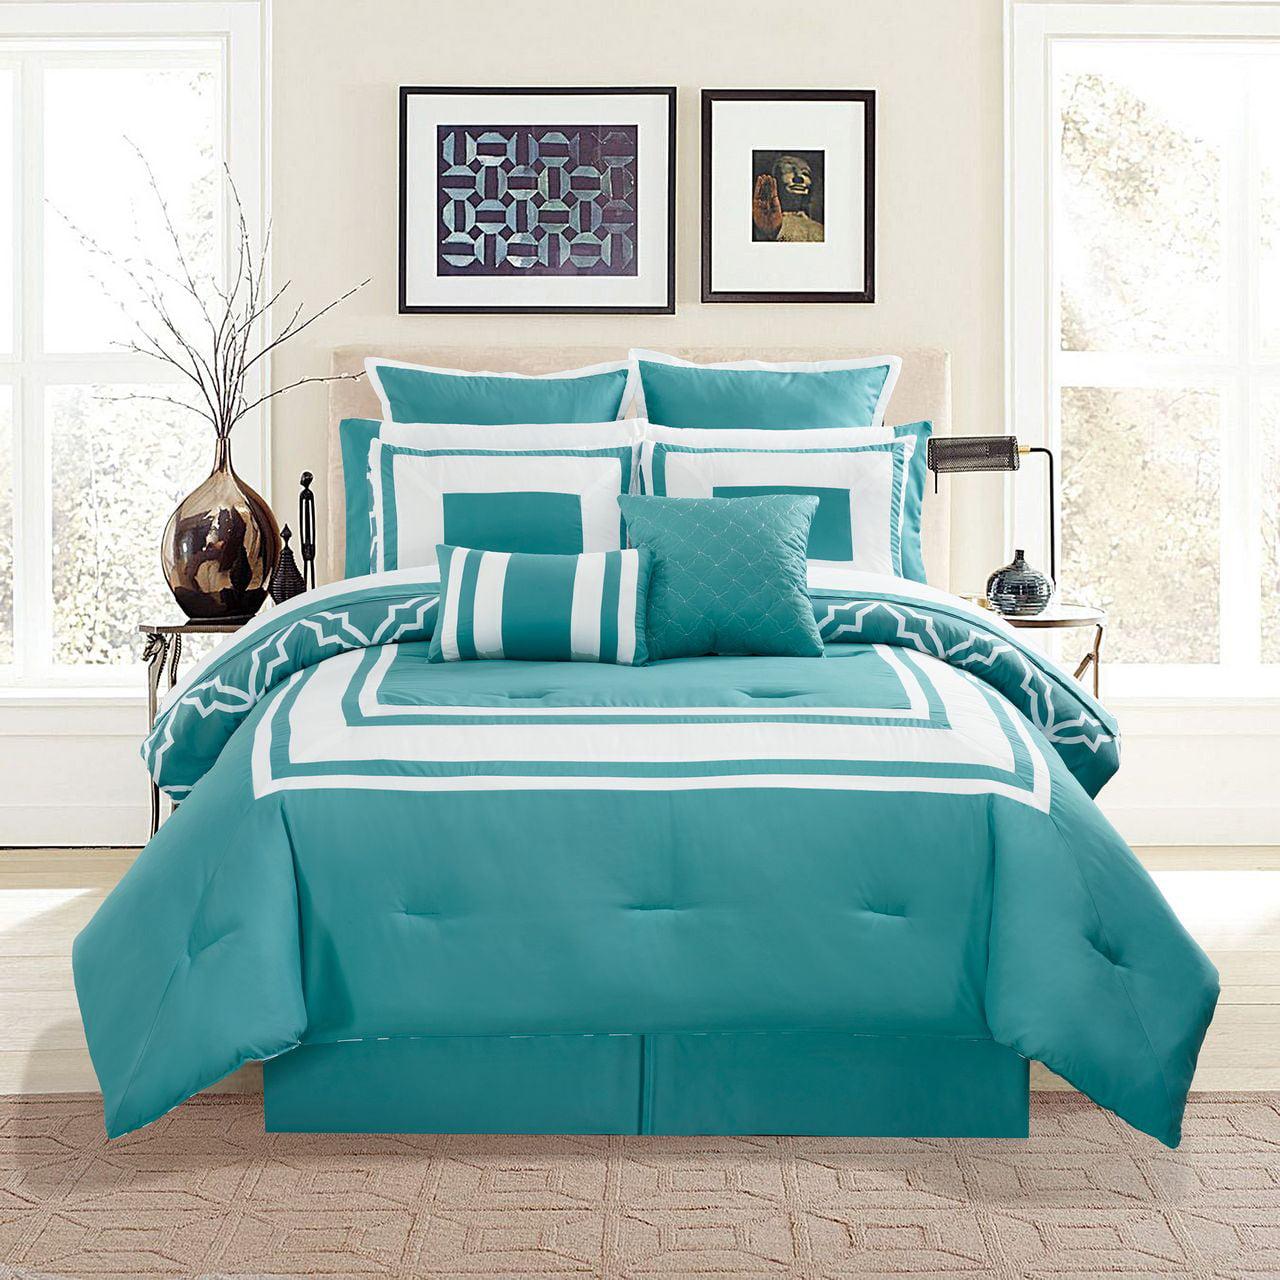 12 Piece Bernard Burgundy Comforter Set with Sheets